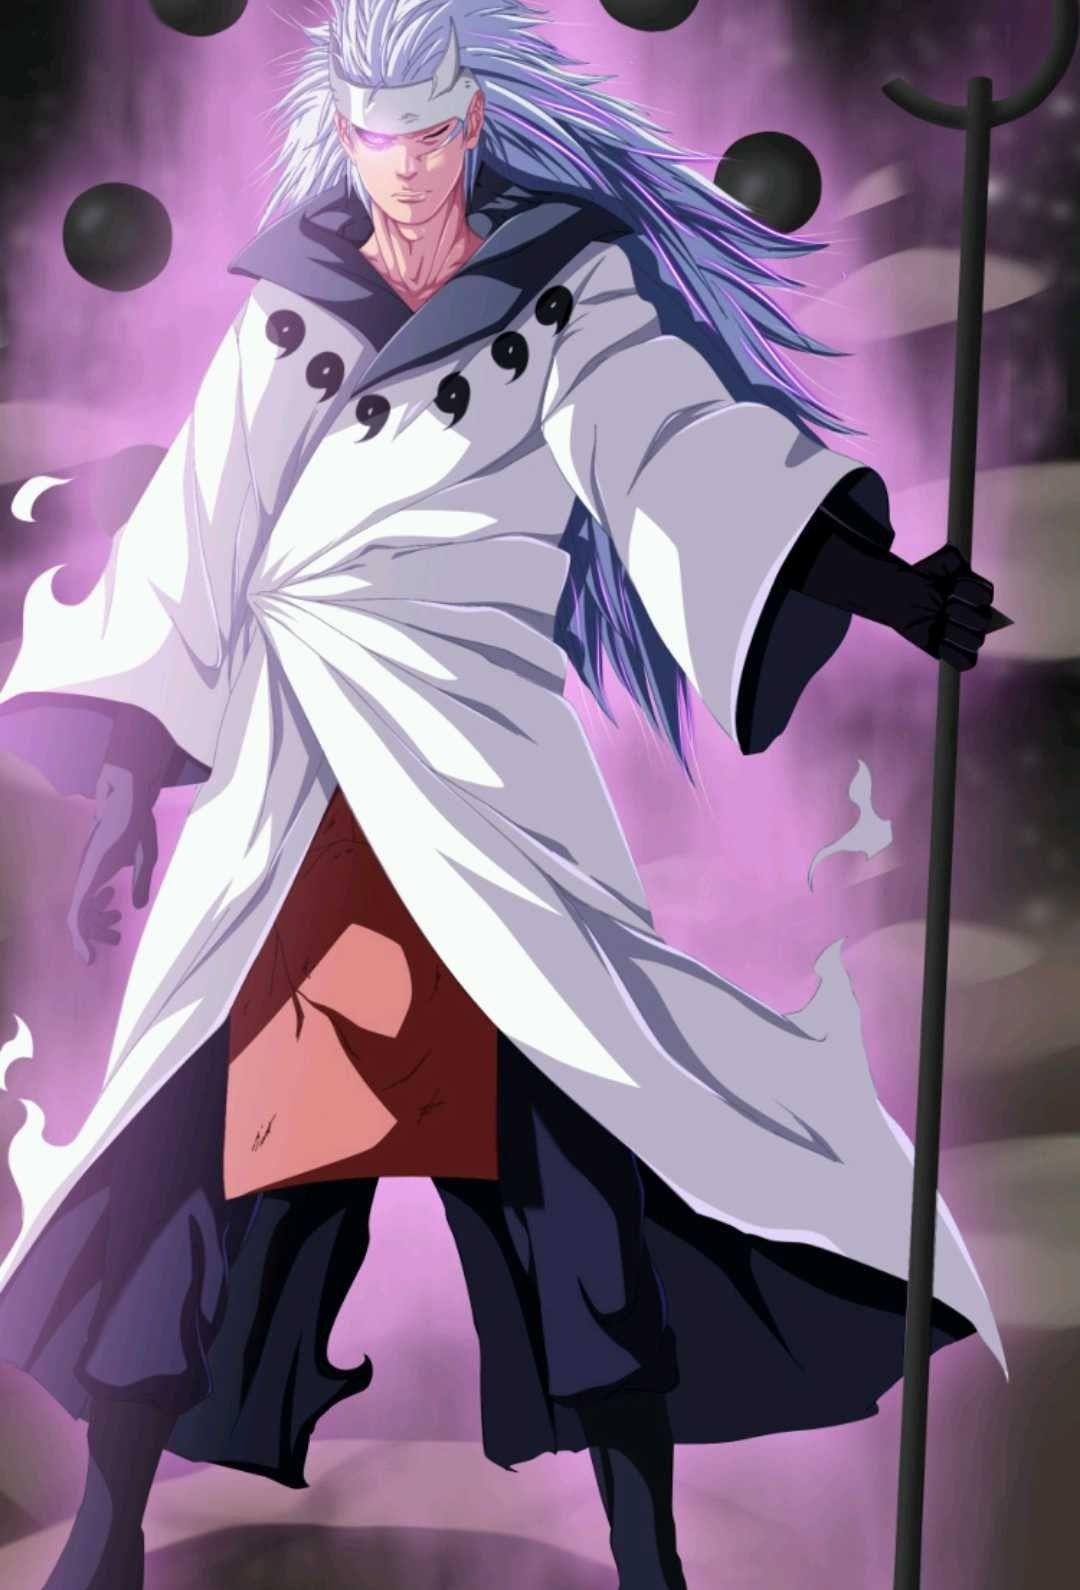 Pin by Zubayr Allie on Series Anime, Art, Naruto